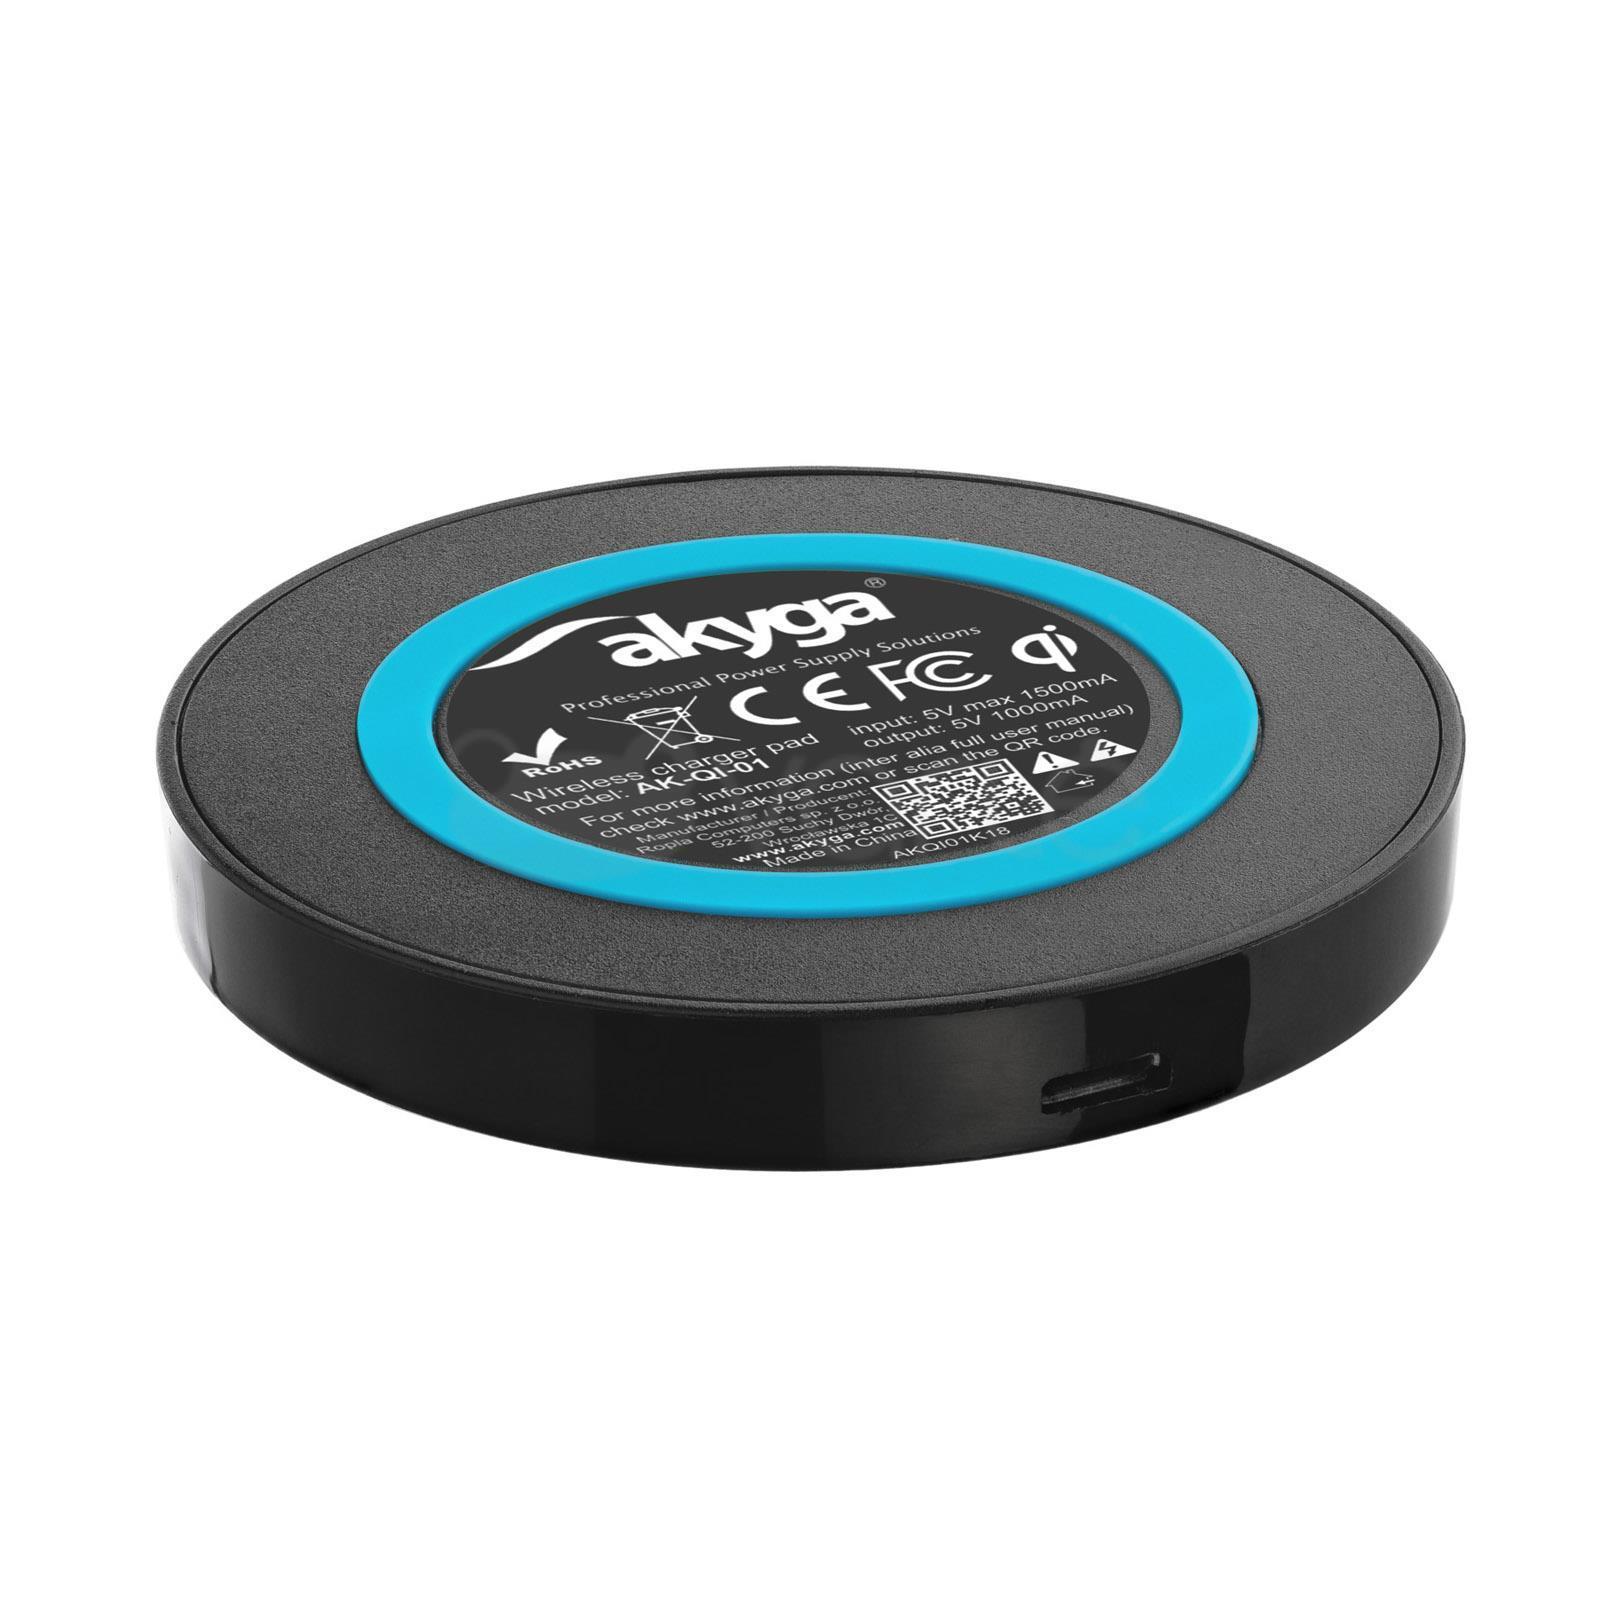 783c125a23 ... Akyga Wireless Induction Charger QI AK-QI-01 5V max 1000mA ...